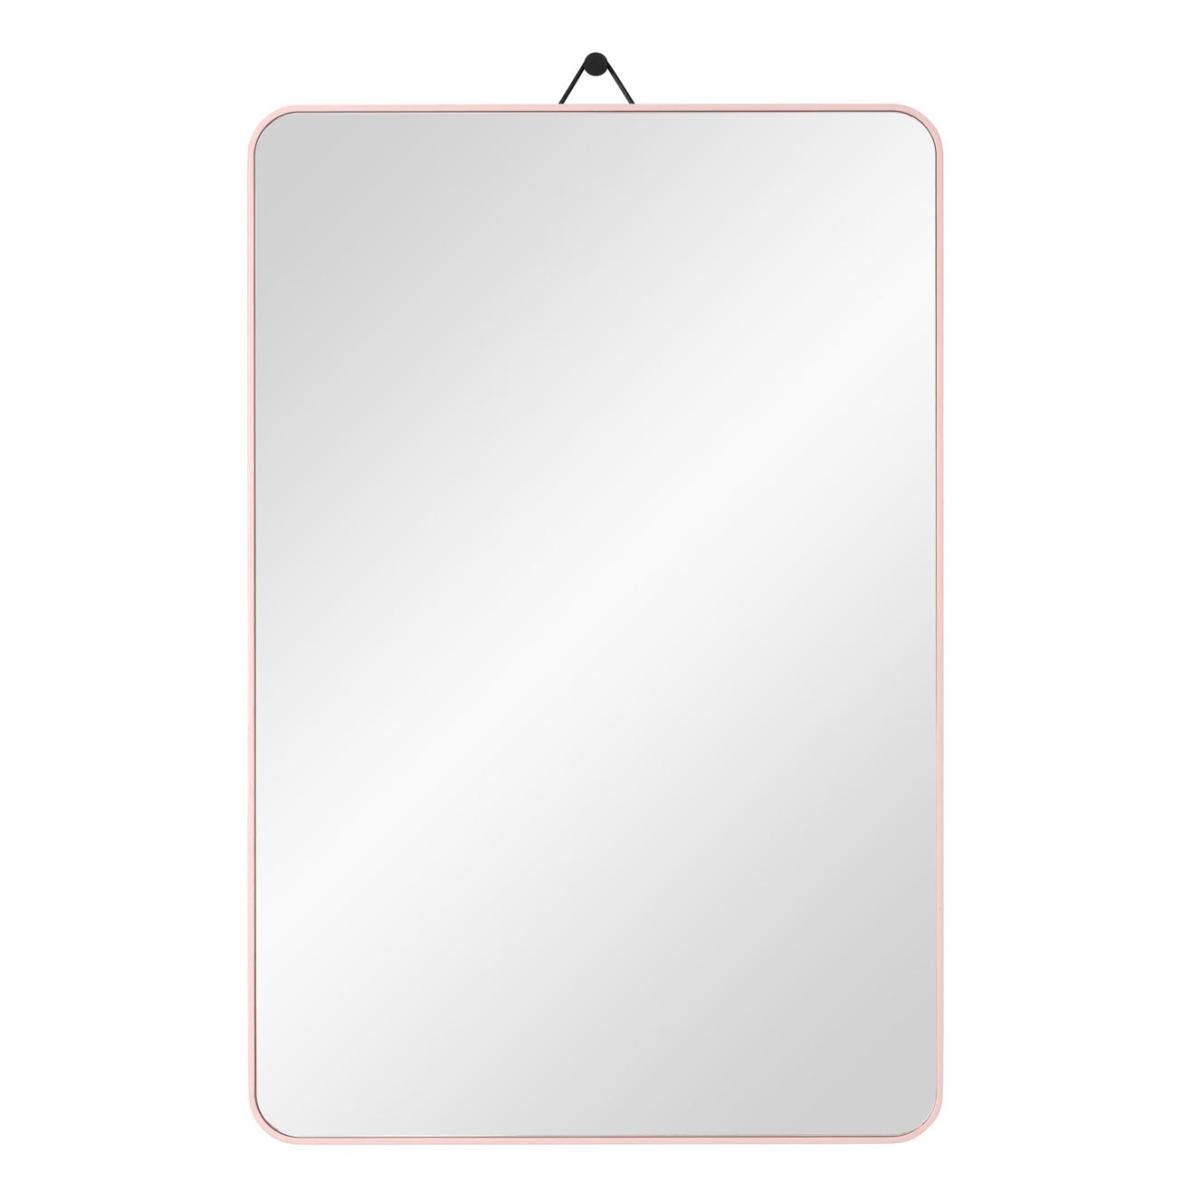 VIEW Spiegel 40 x 60 cm Eiche altrosa